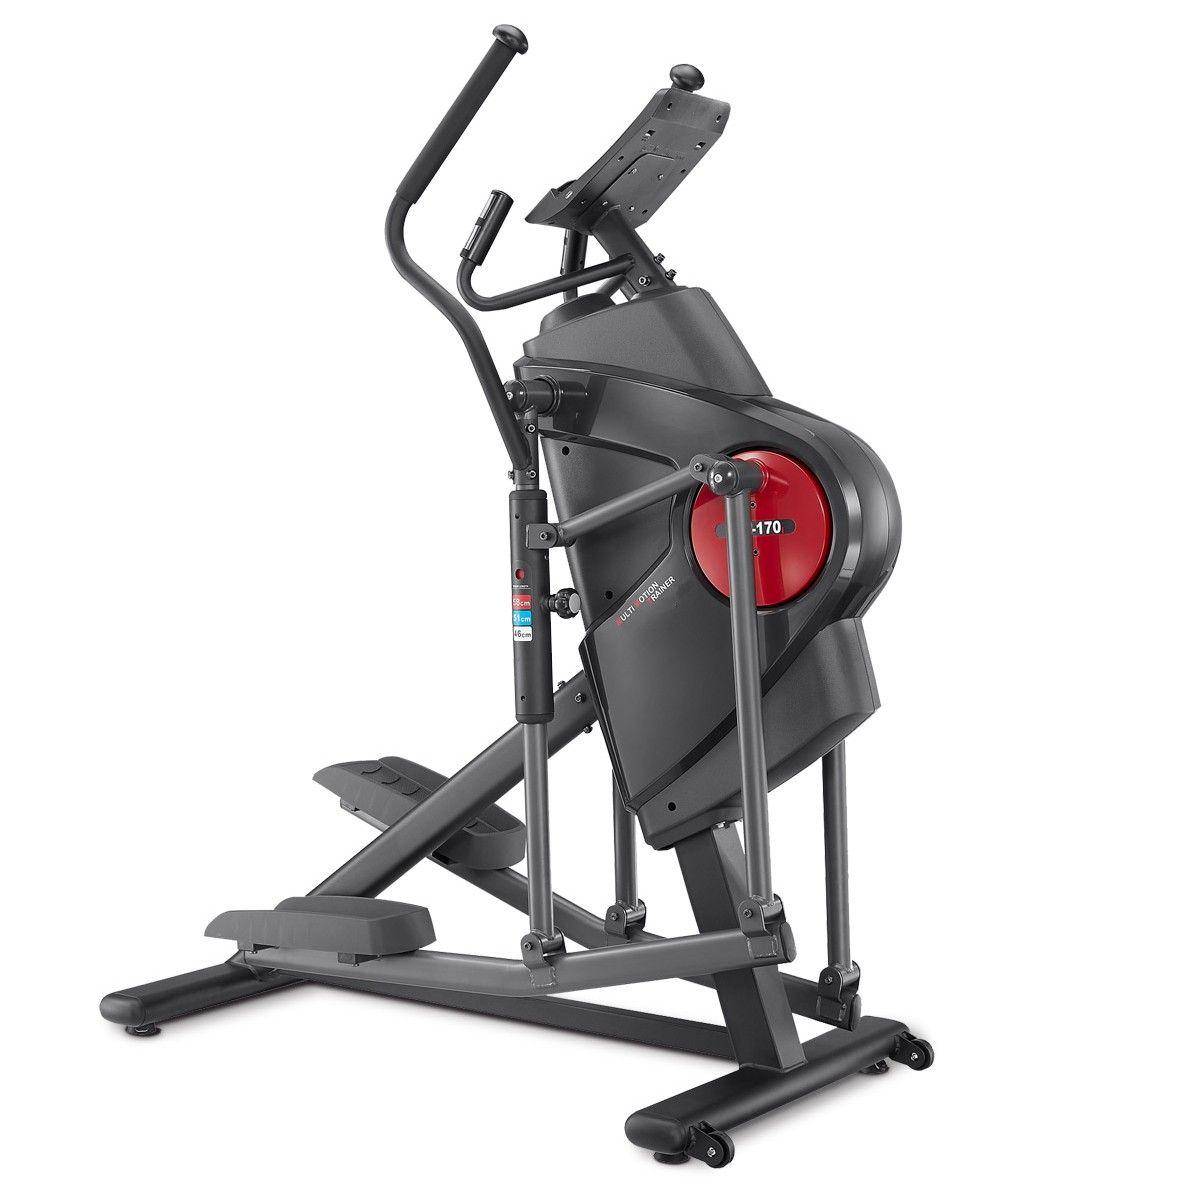 Dkn xc i multi motion elliptical cross trainer